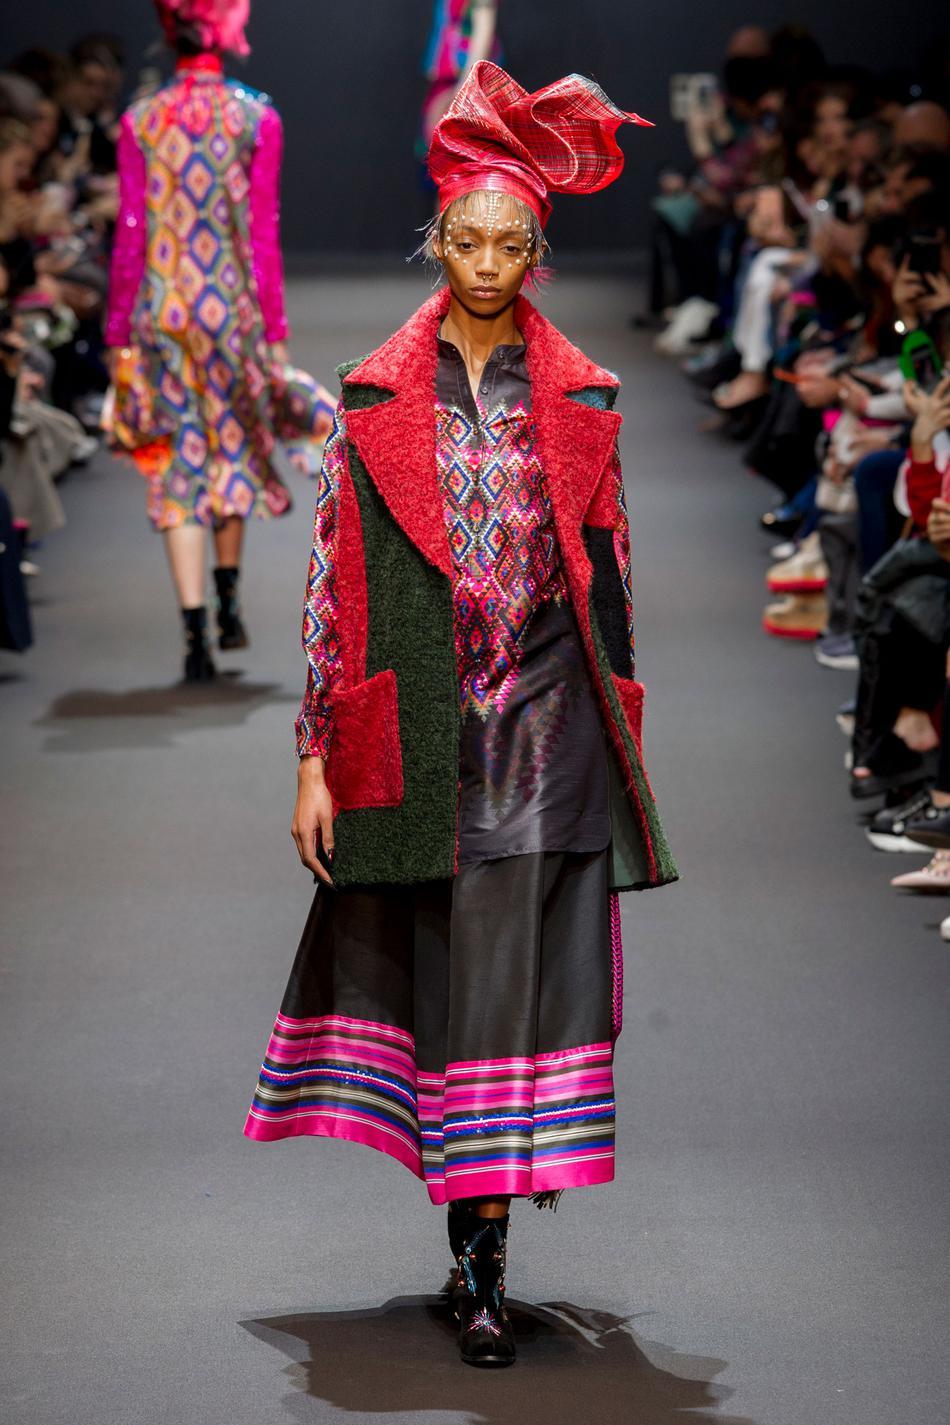 Défilé Manish Arora Fashion Week 2017 - Look 9